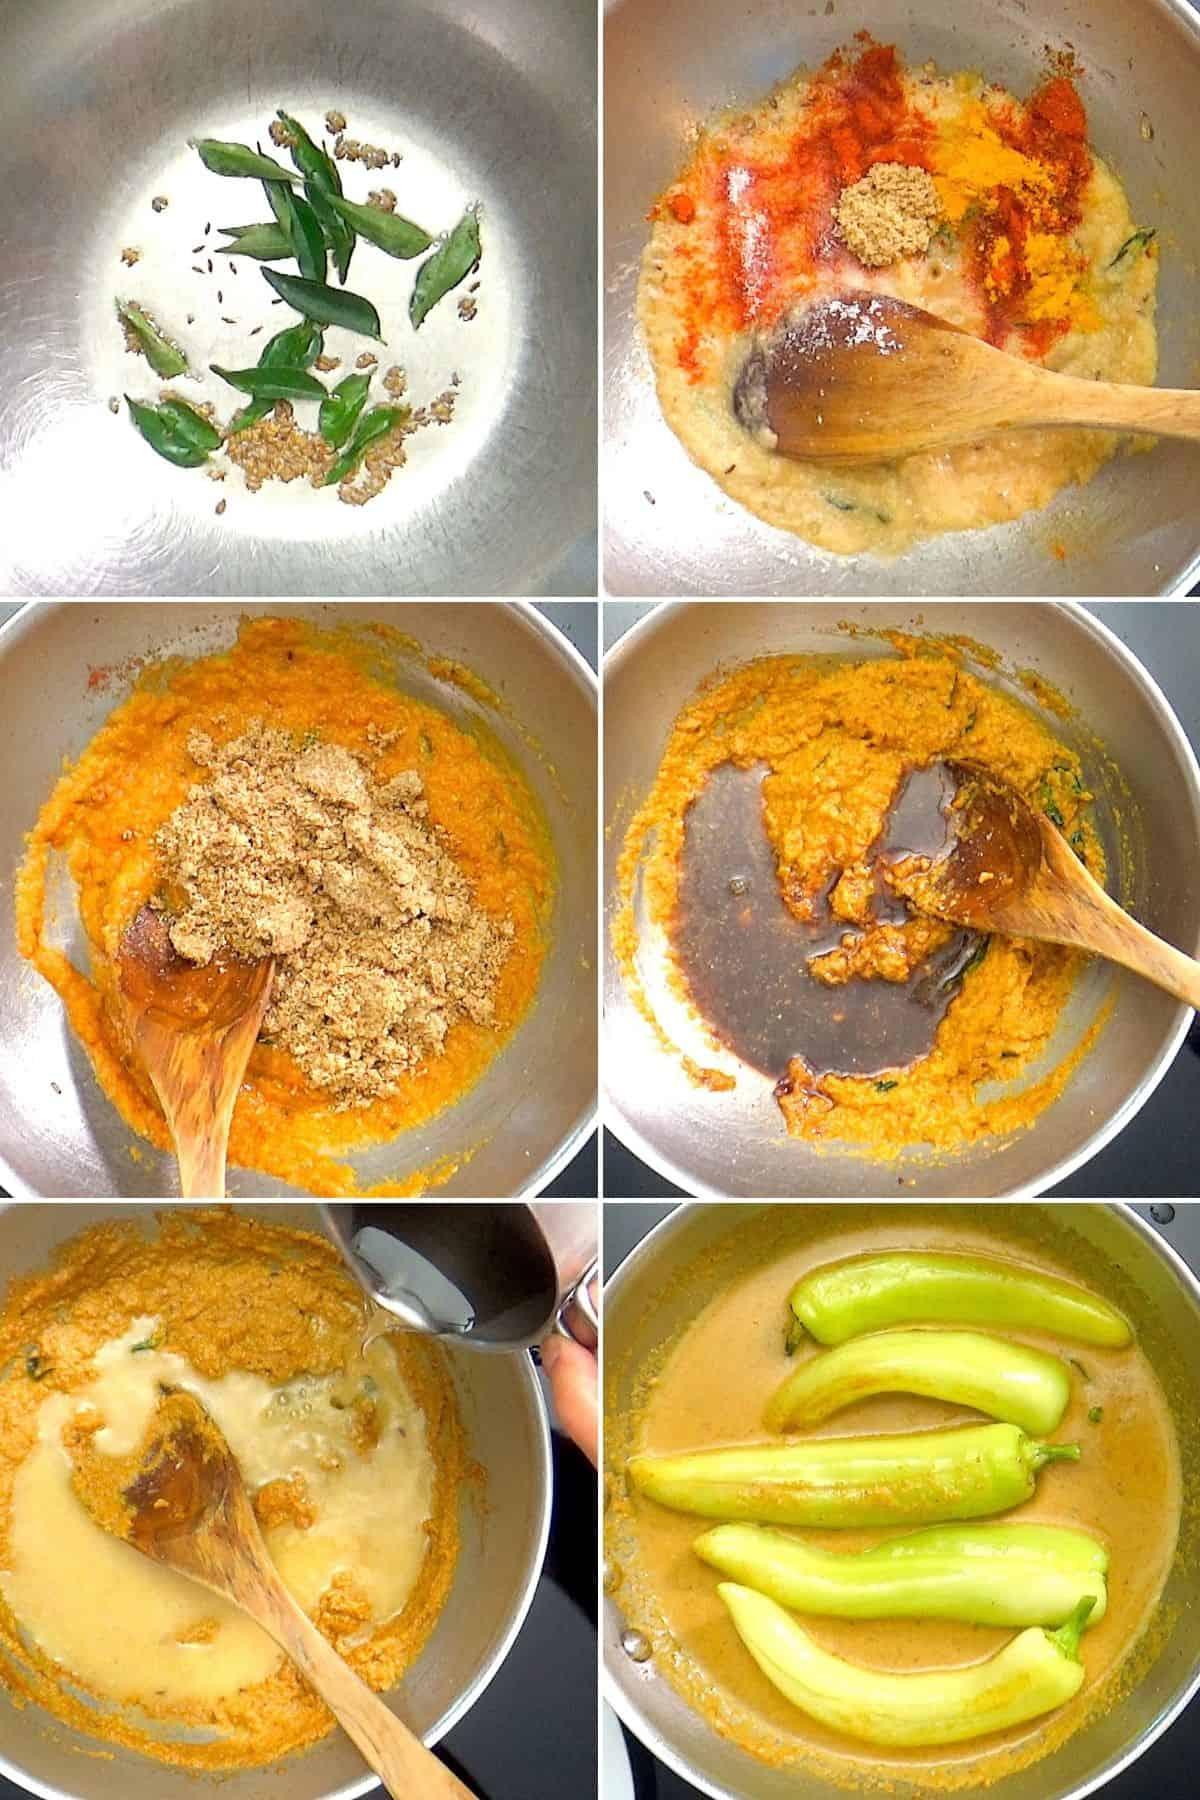 Step by step making of mirchi ka salan.